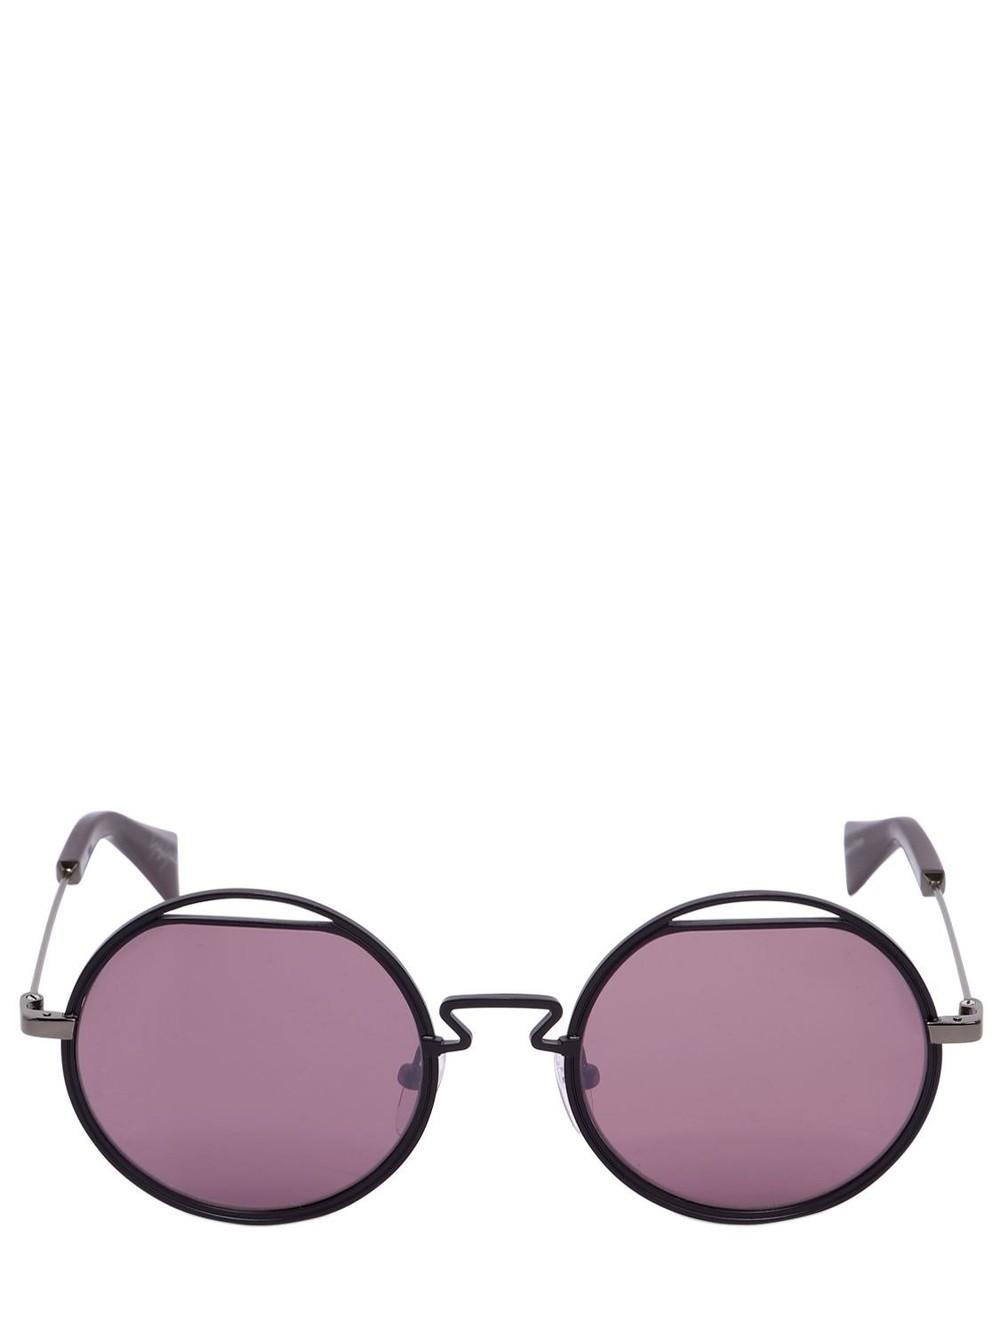 YOHJI YAMAMOTO Round Metal Cutout Sunglasses in purple